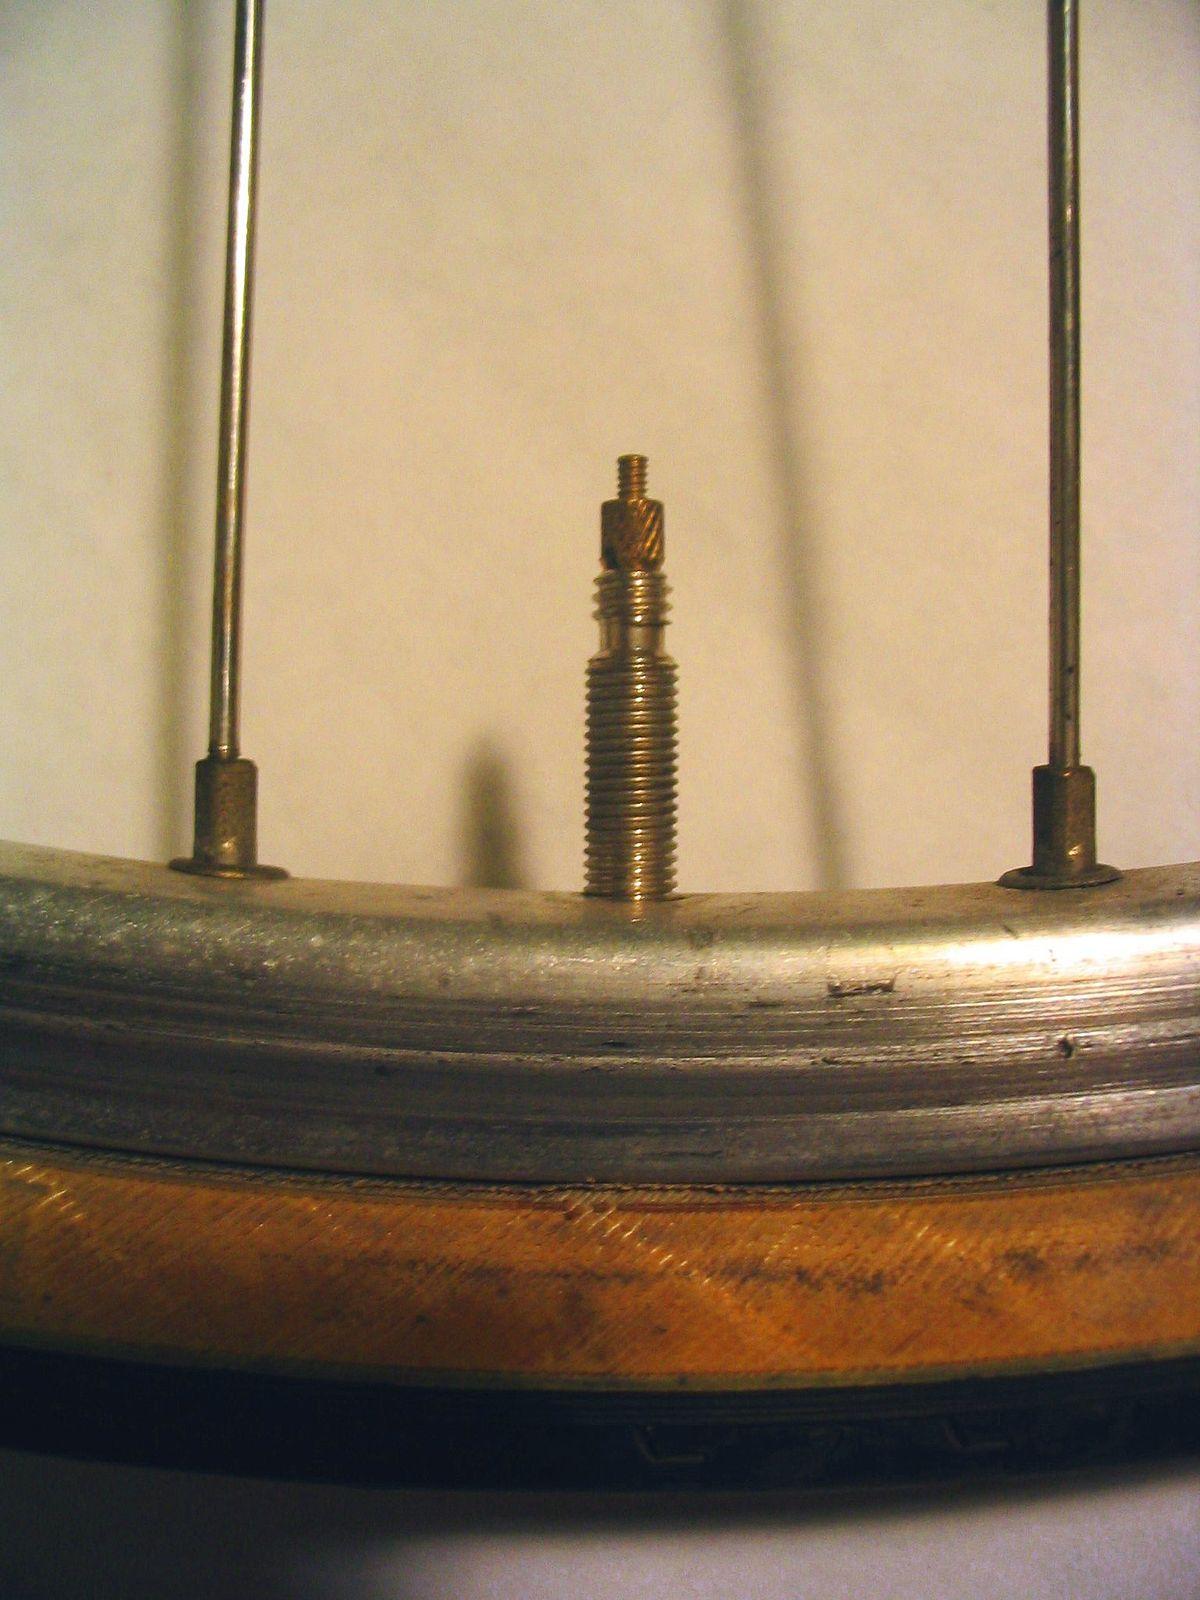 Presta valve - Wikipedia